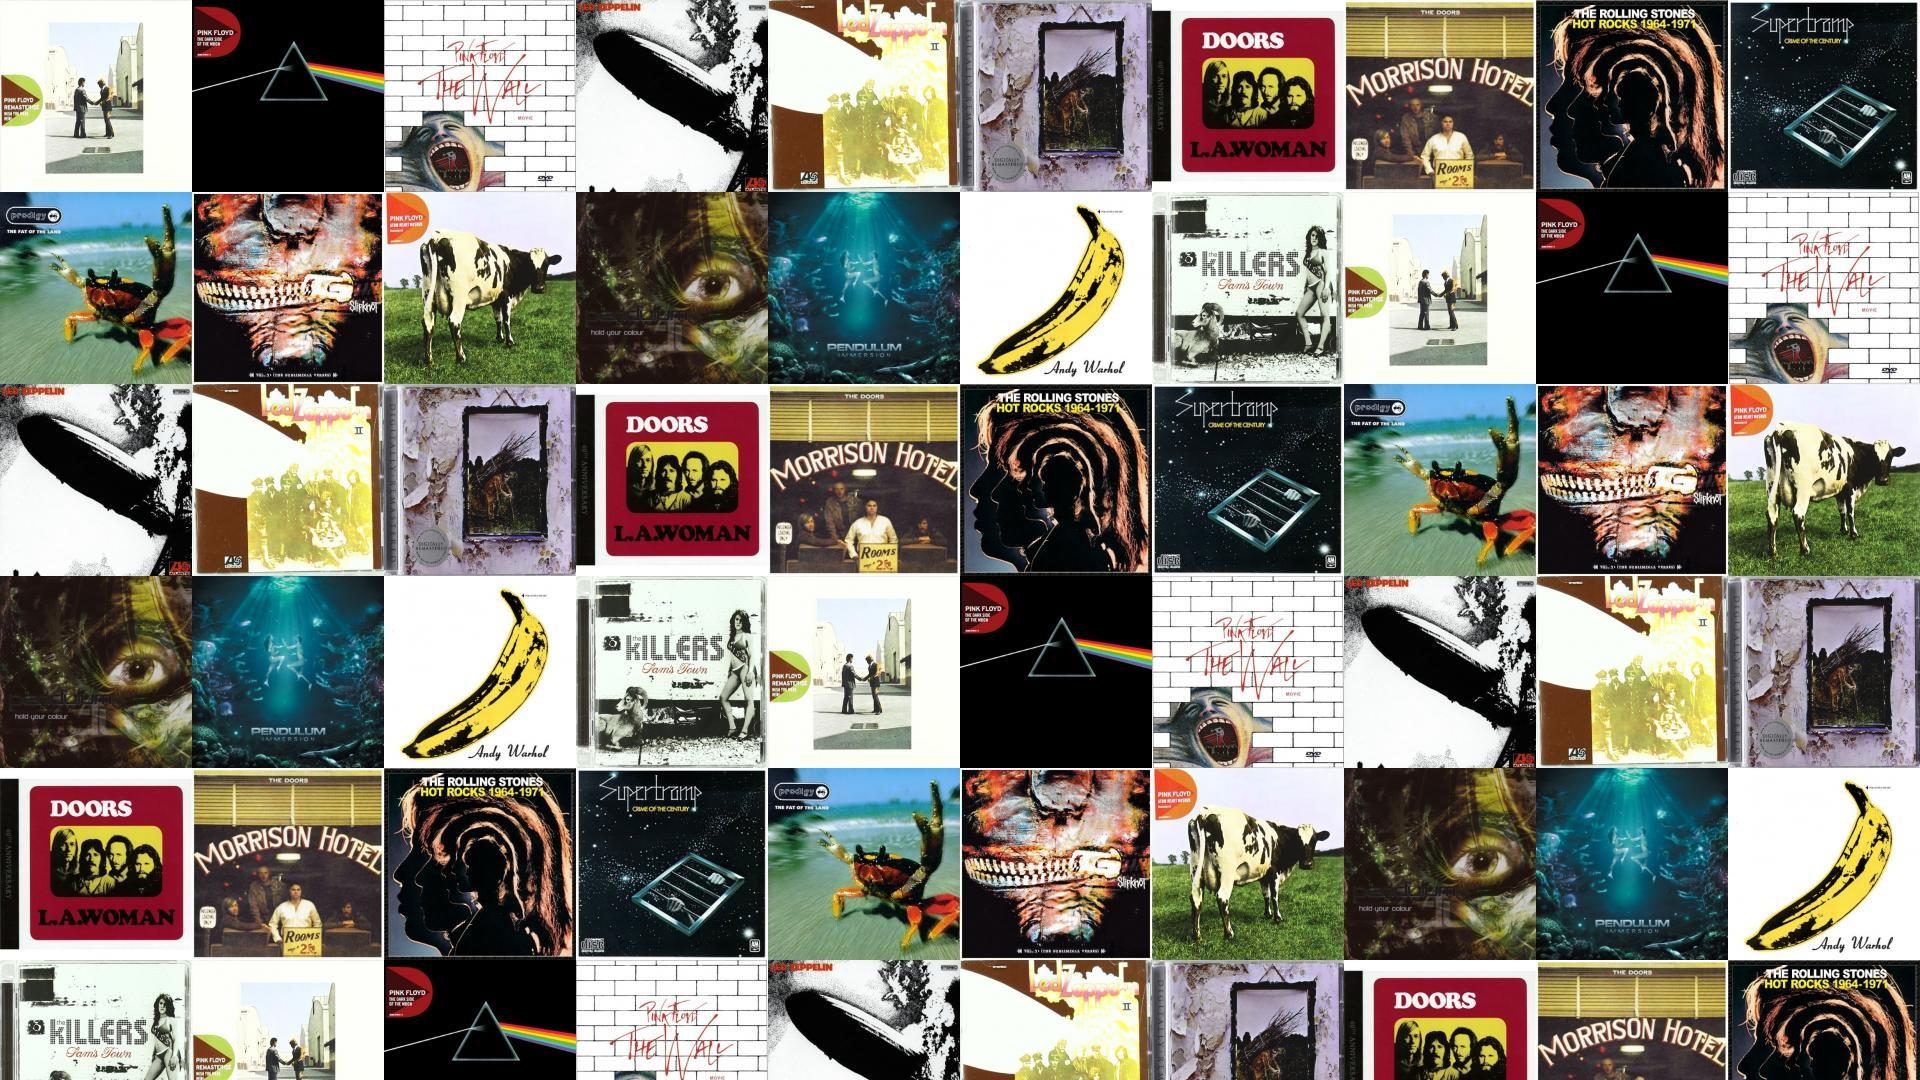 Pink Floyd Wish You Were Here Dark Side Wallpaper Â« Tiled Desktop Wallpaper